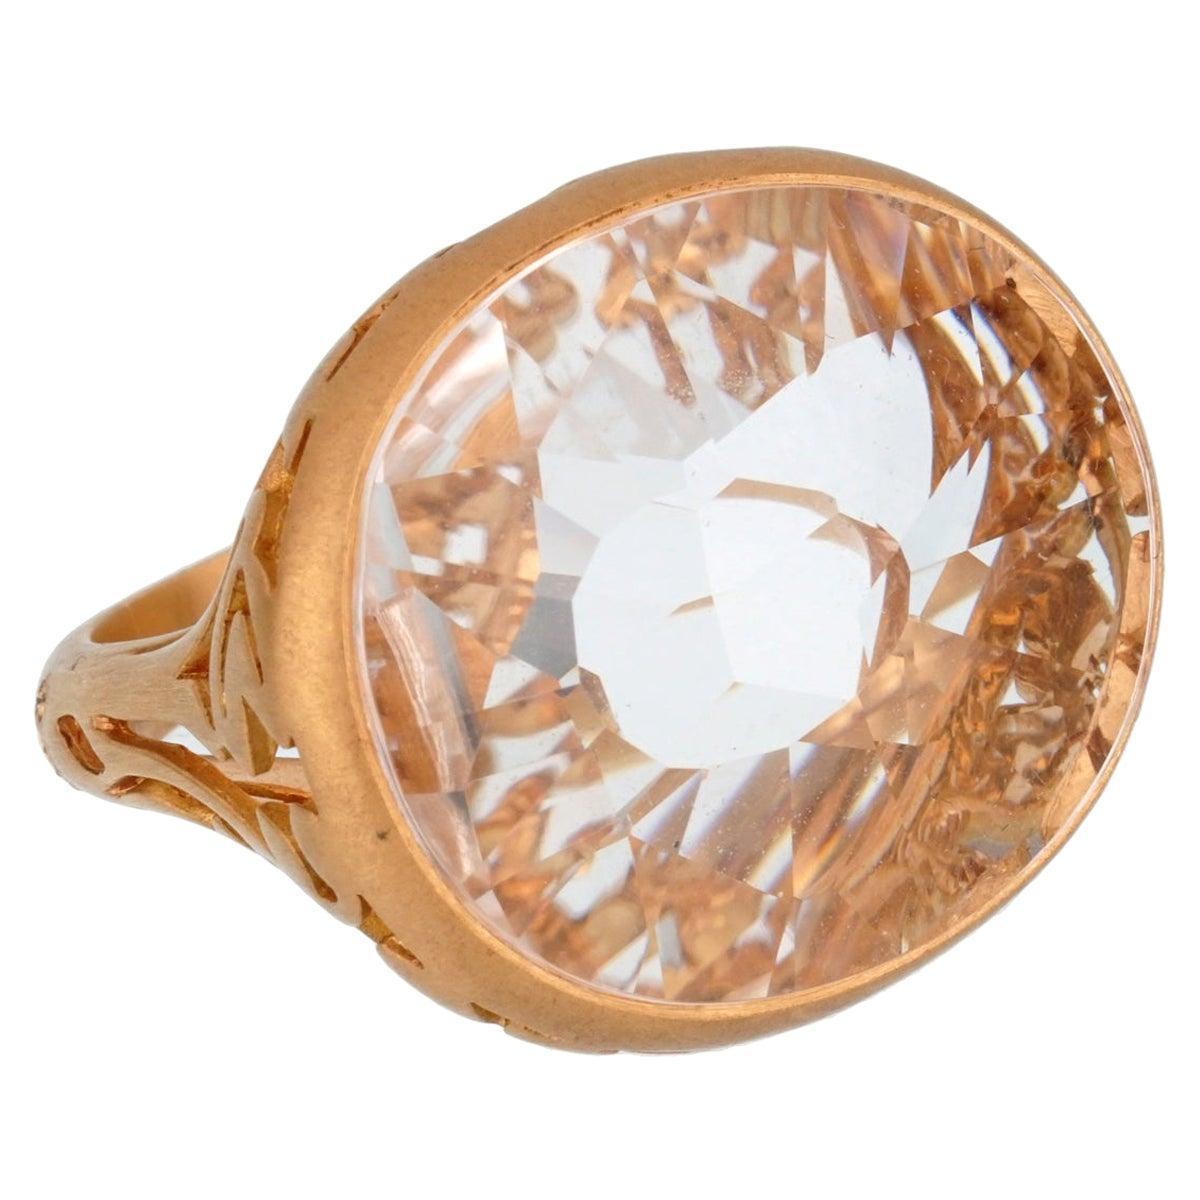 Pomellato 10 Carat White Quartz Cocktail Rose Gold Ring